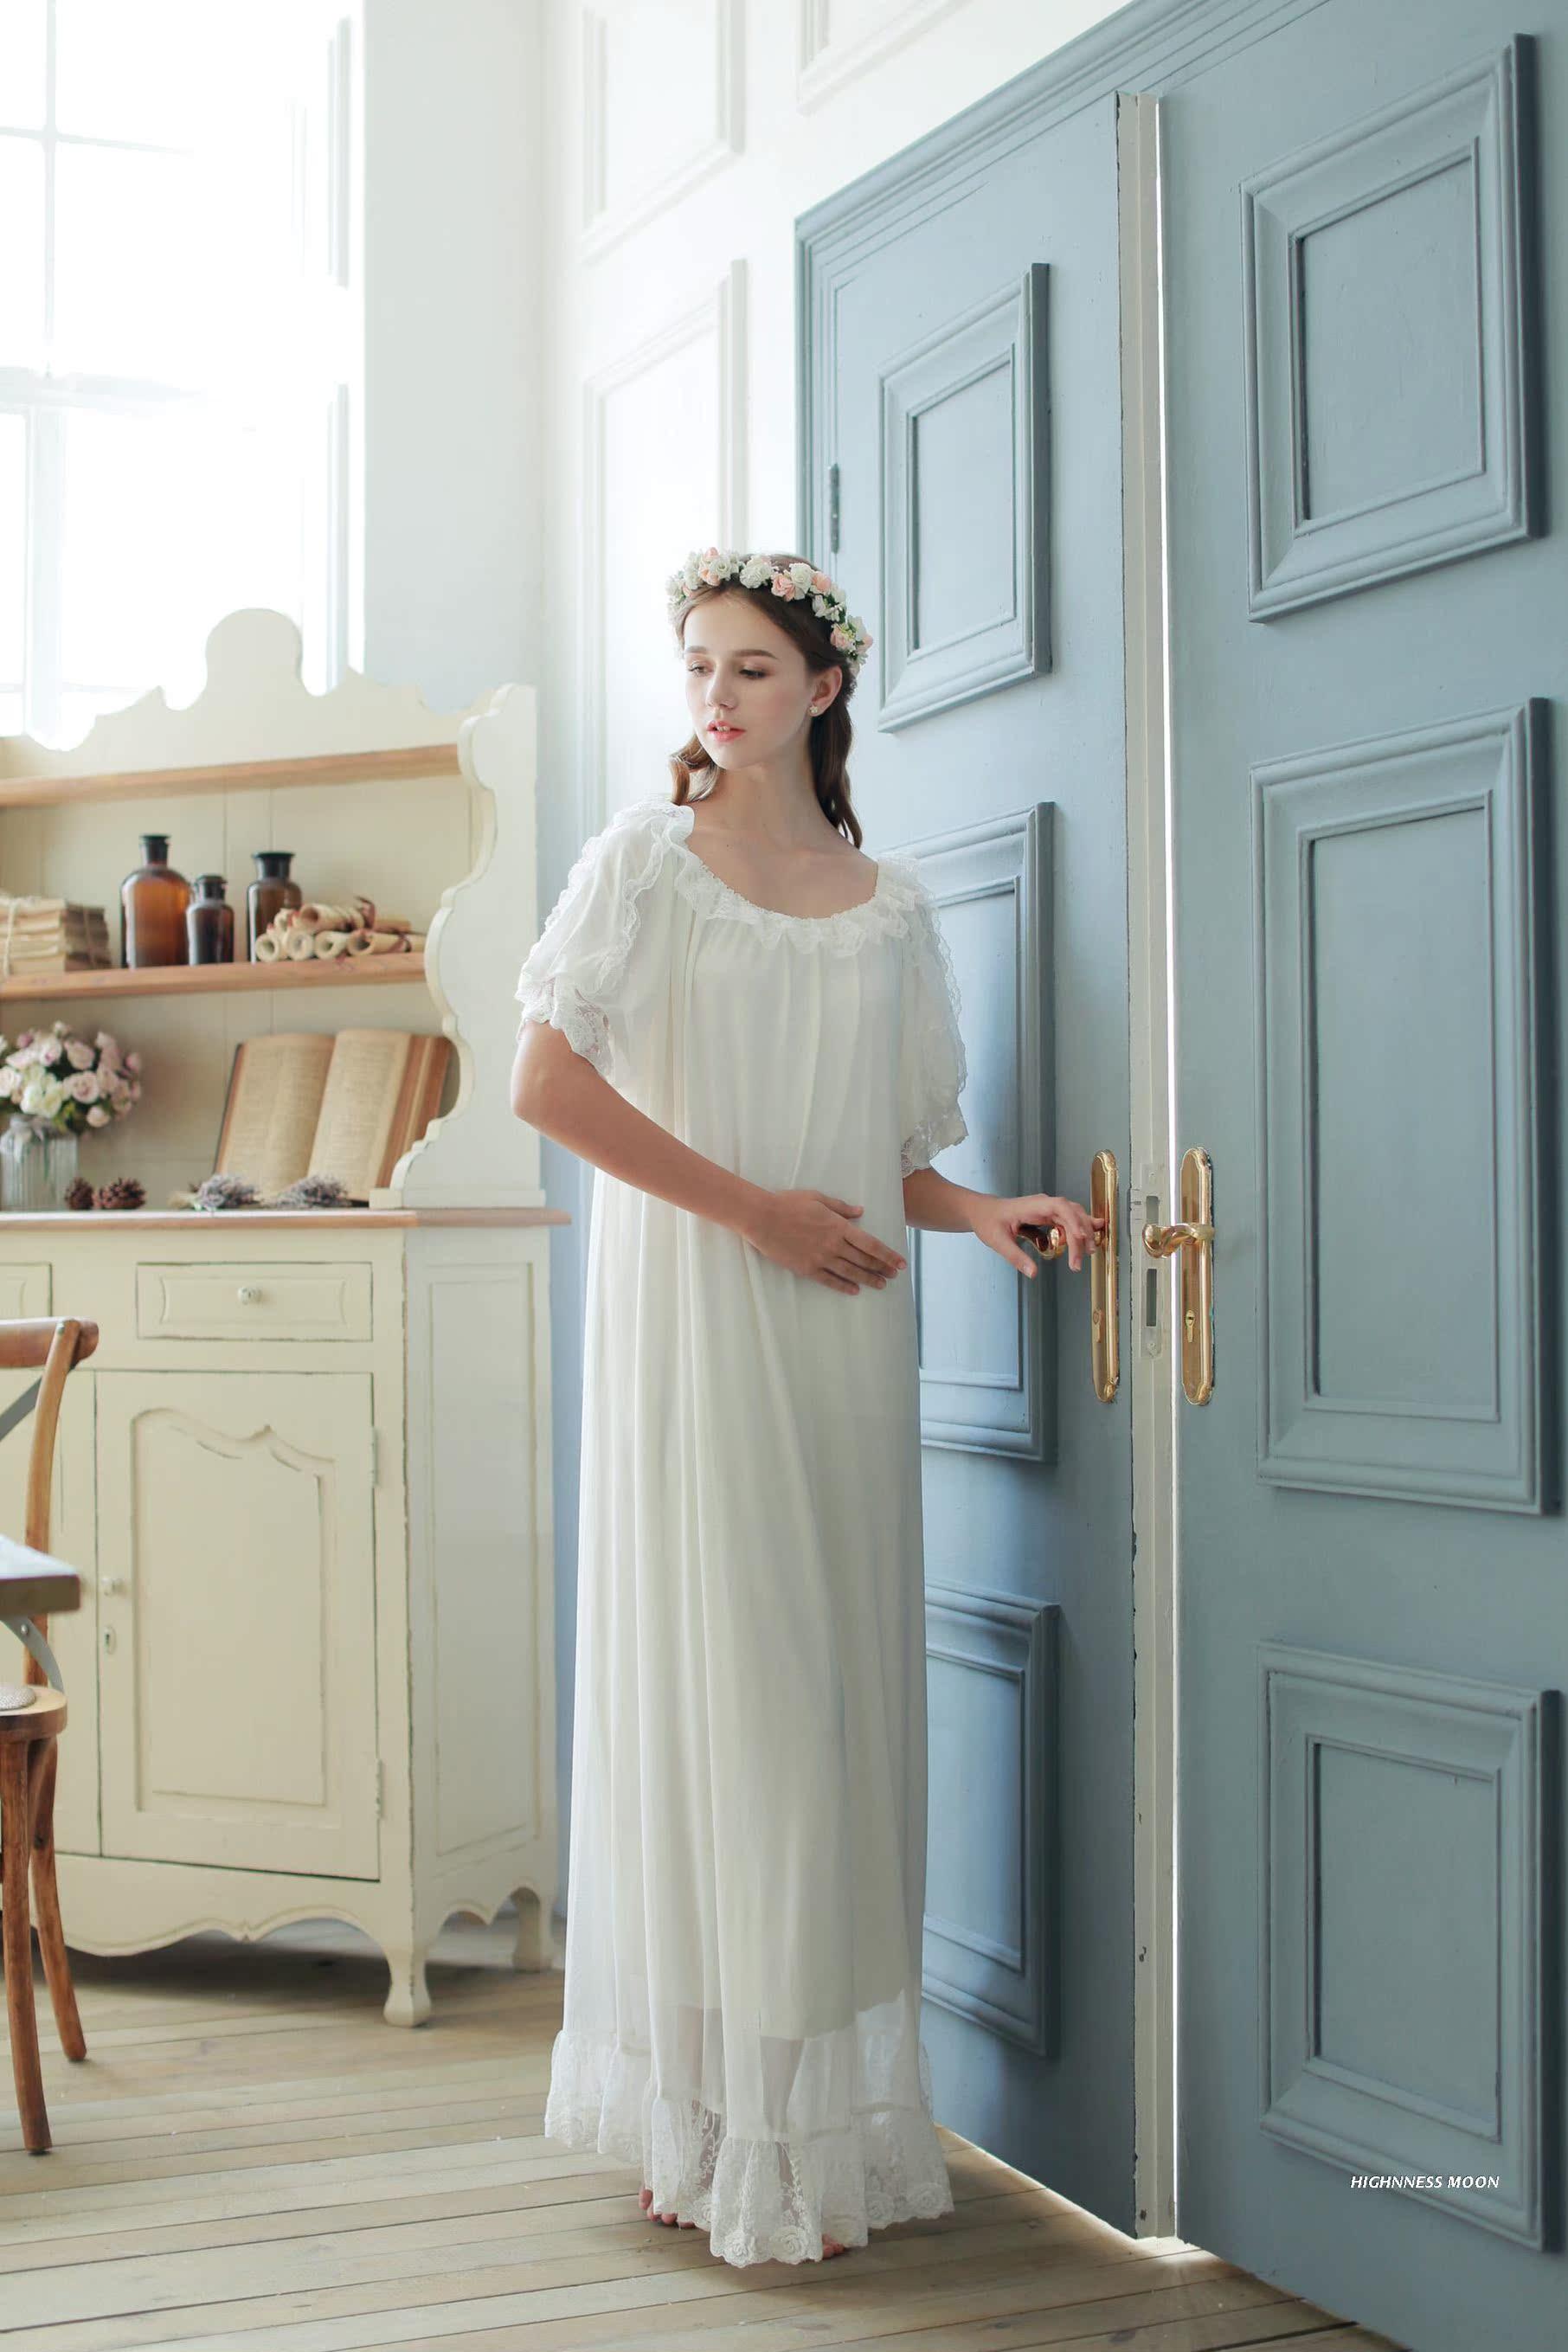 939067b04e ... lightbox moreview · lightbox moreview. PrevNext. (Dream)summer Princess  lace short sleeve long nightdress ...